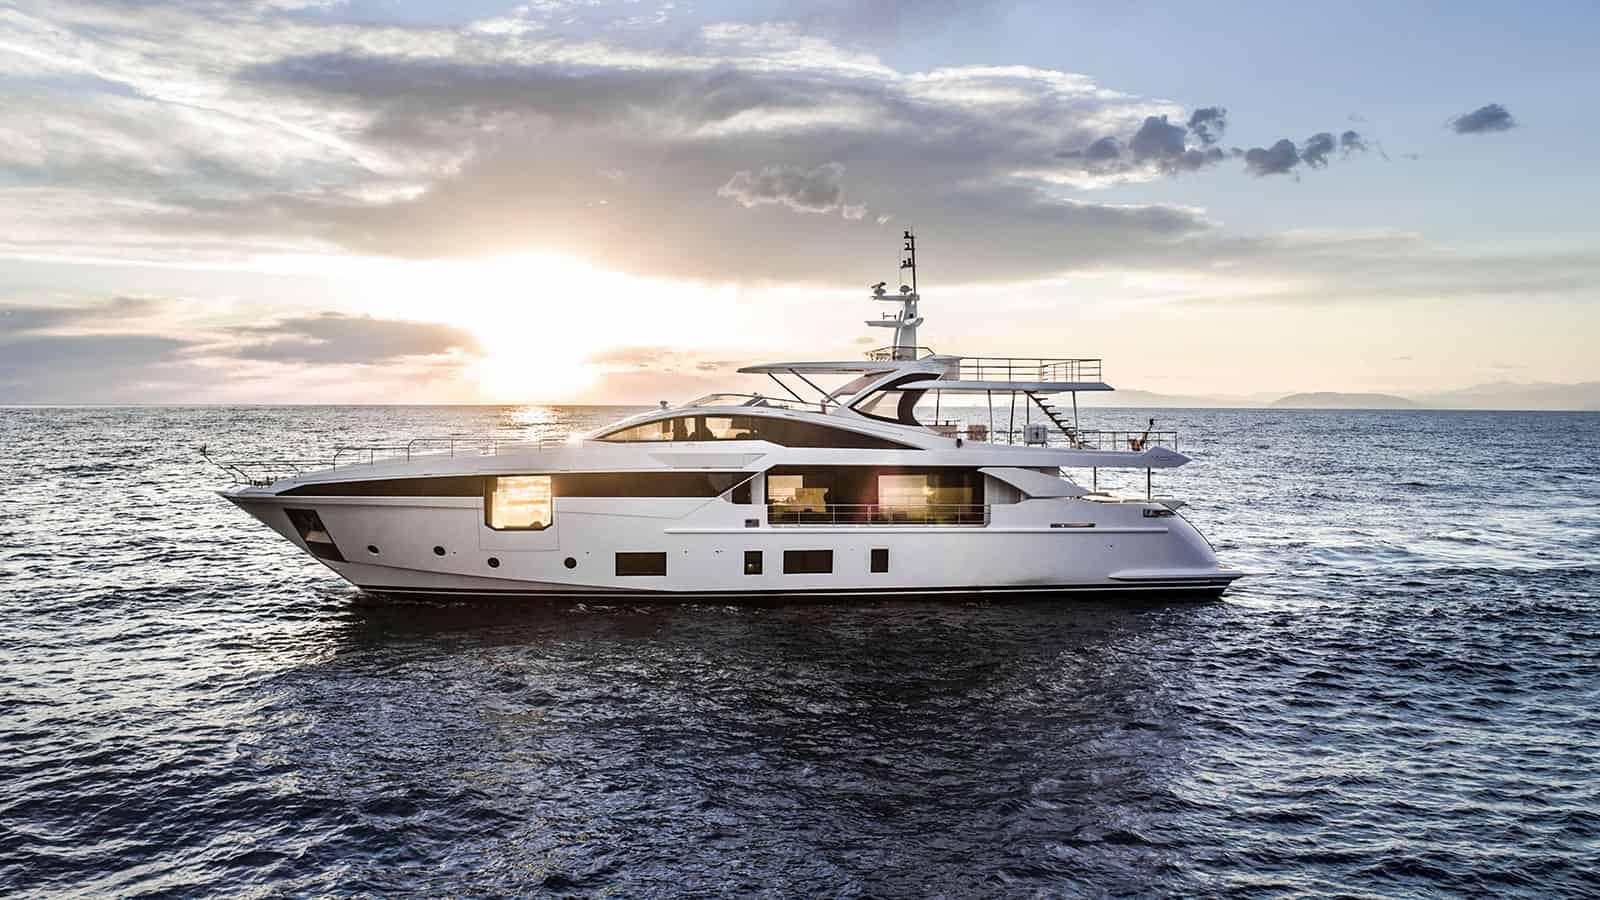 Azimut Grande 35 Metri yacht